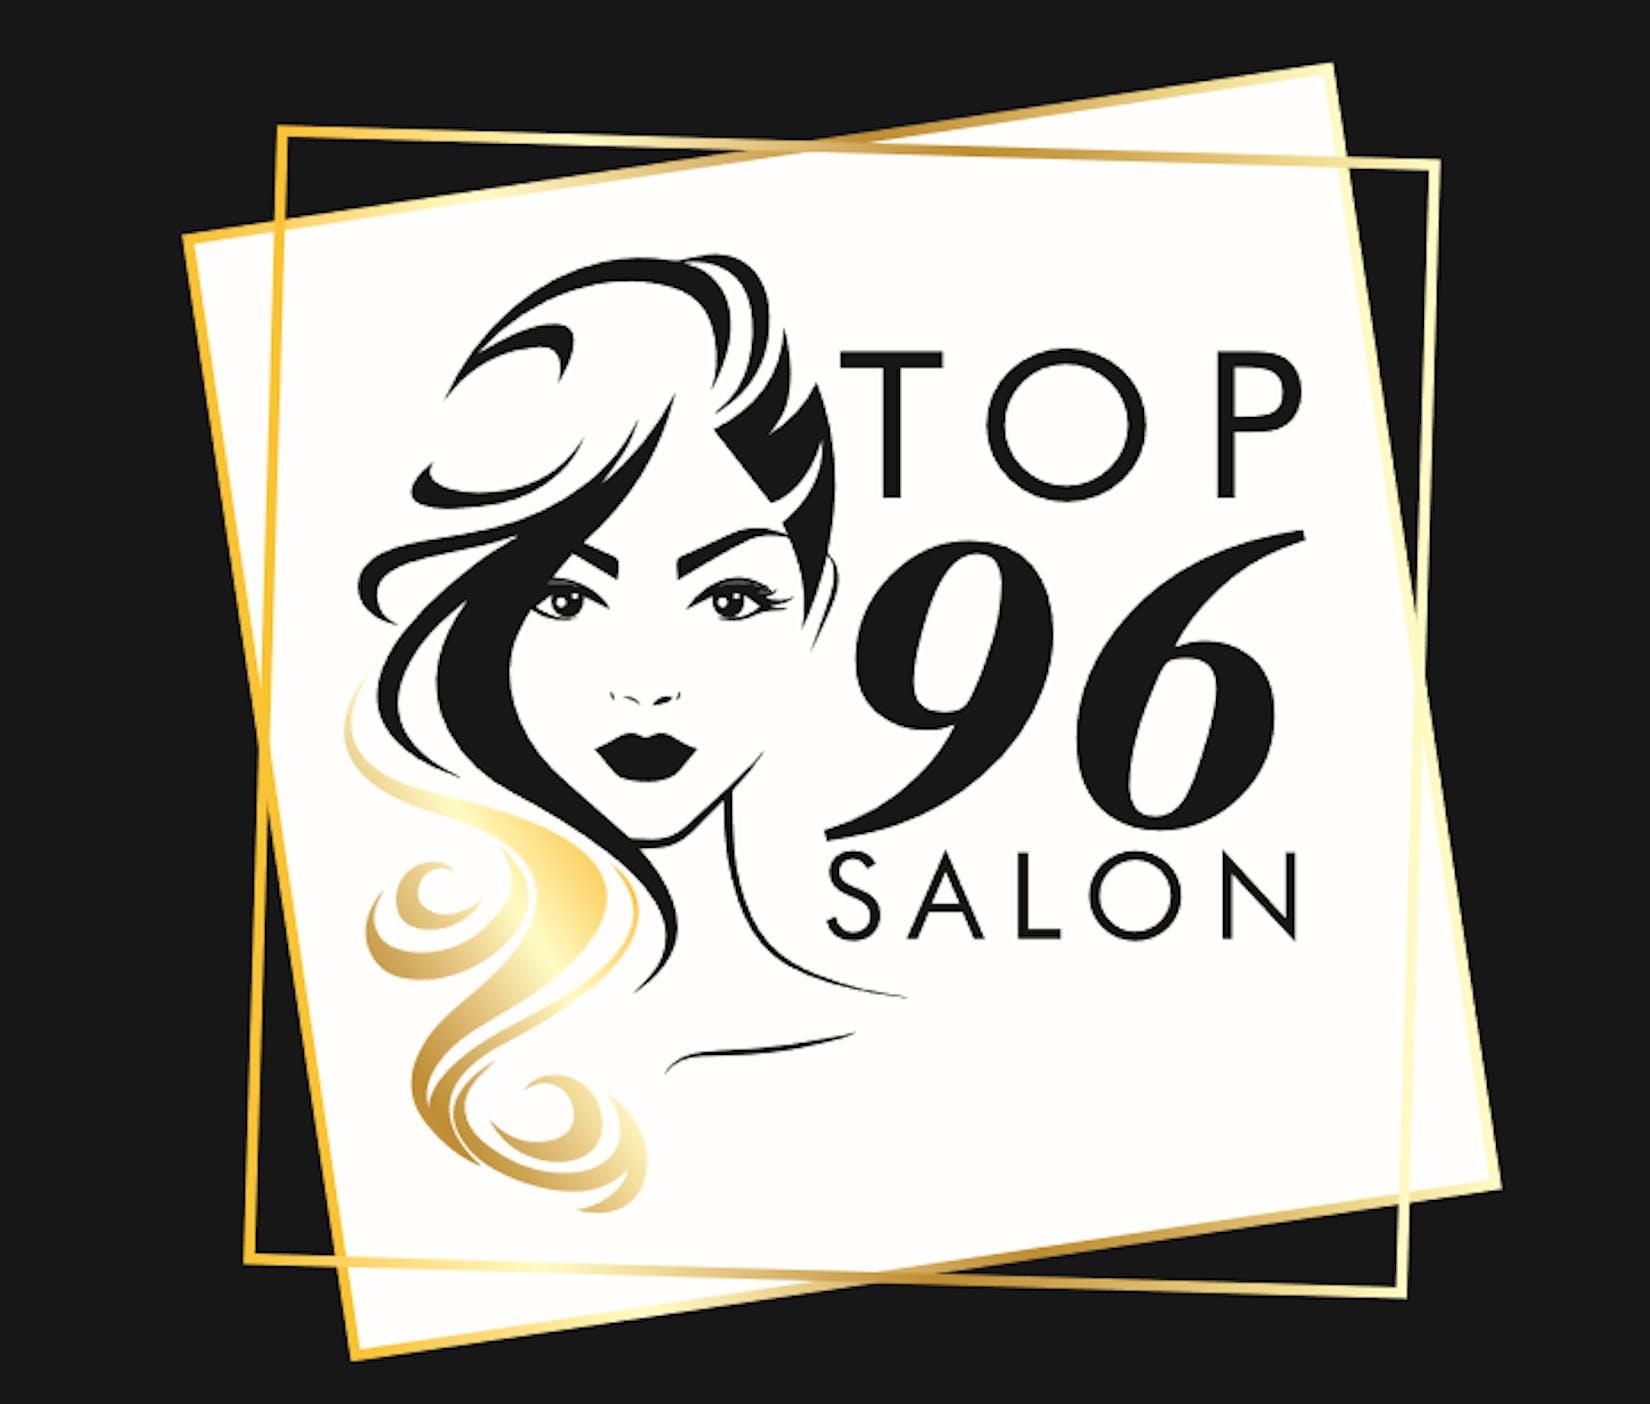 Top 96 Salon | Beauty